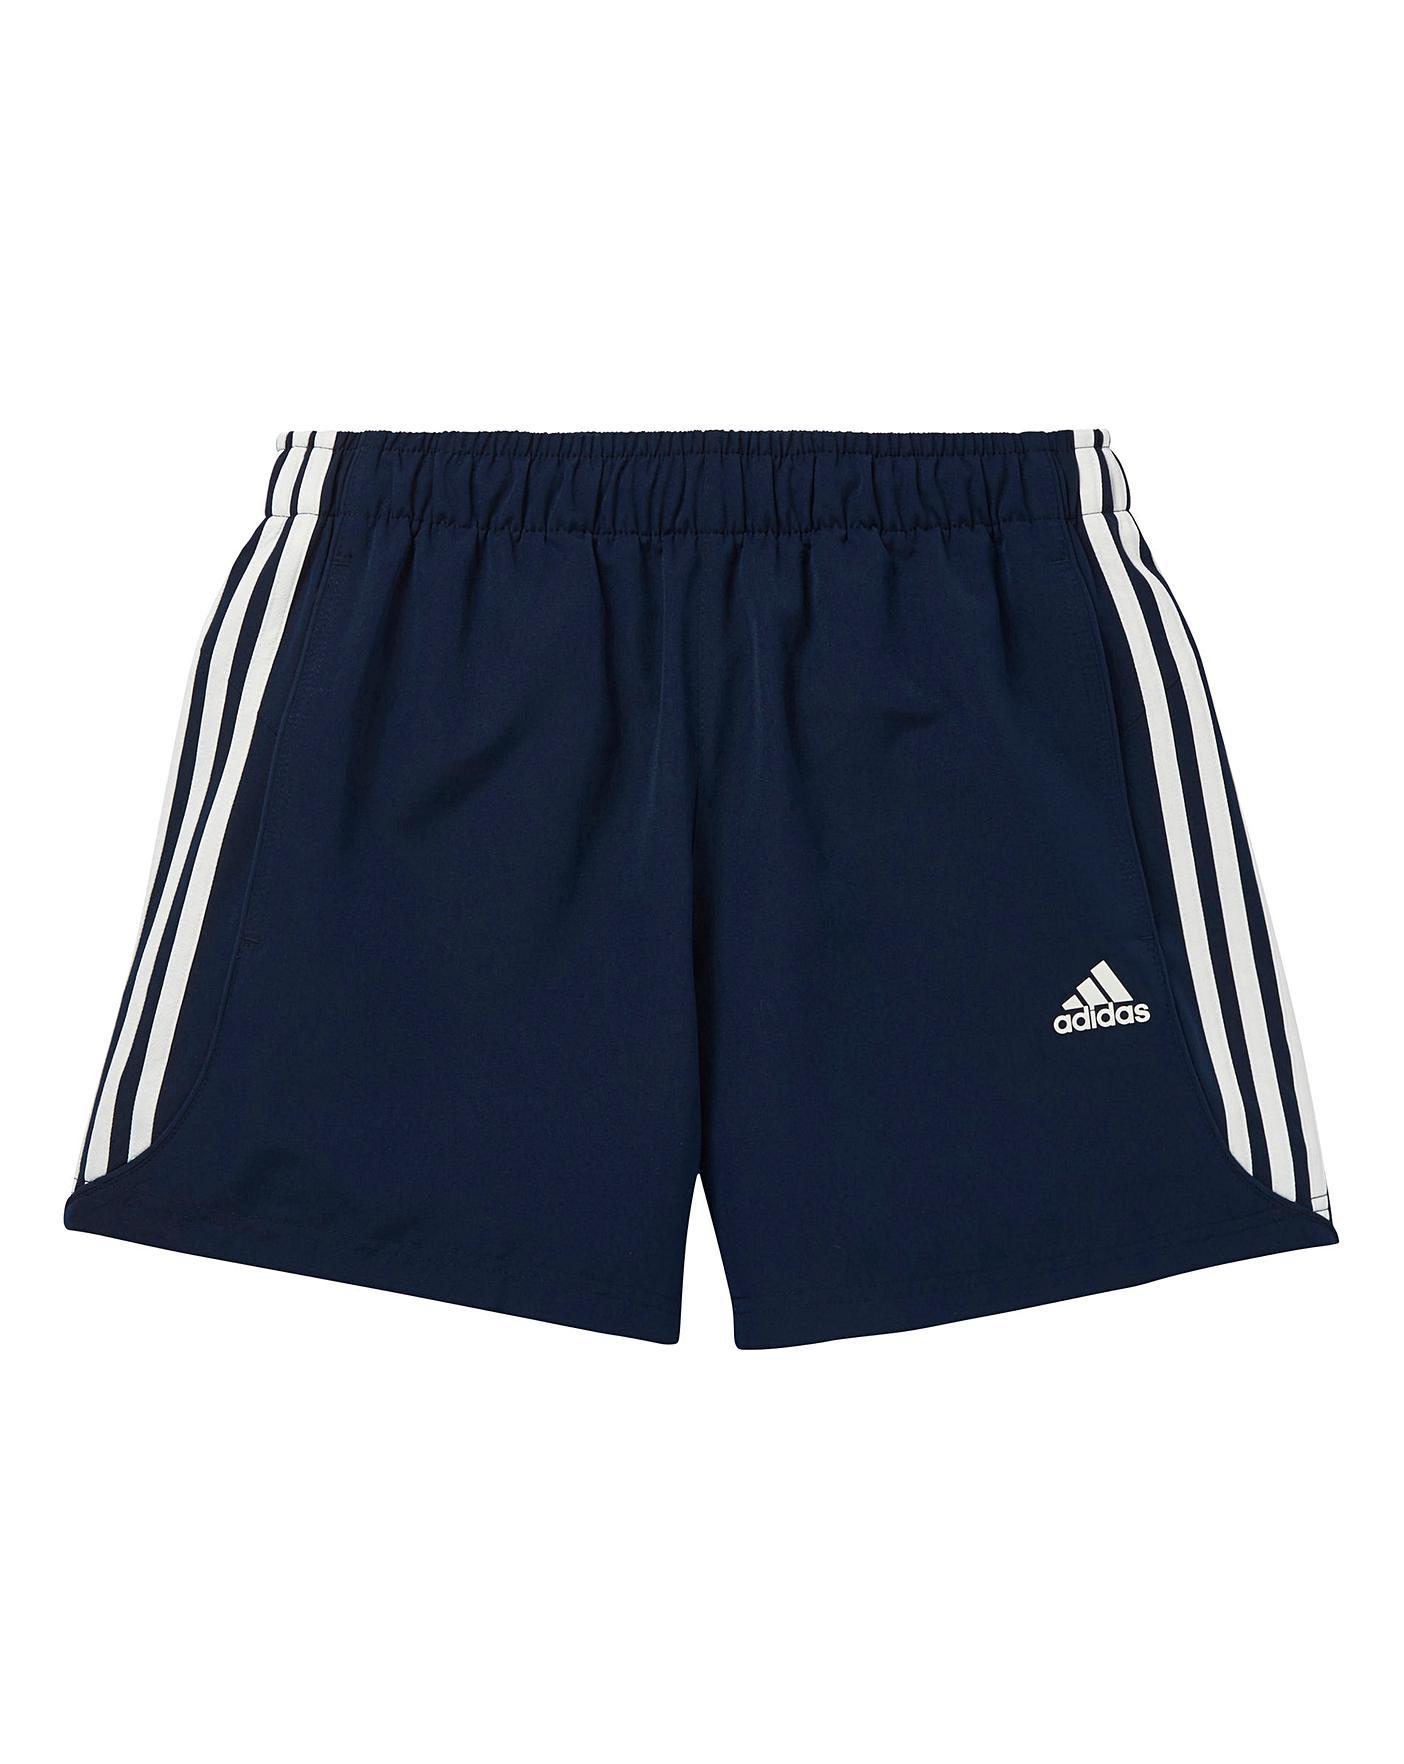 adidas shorts chelsea